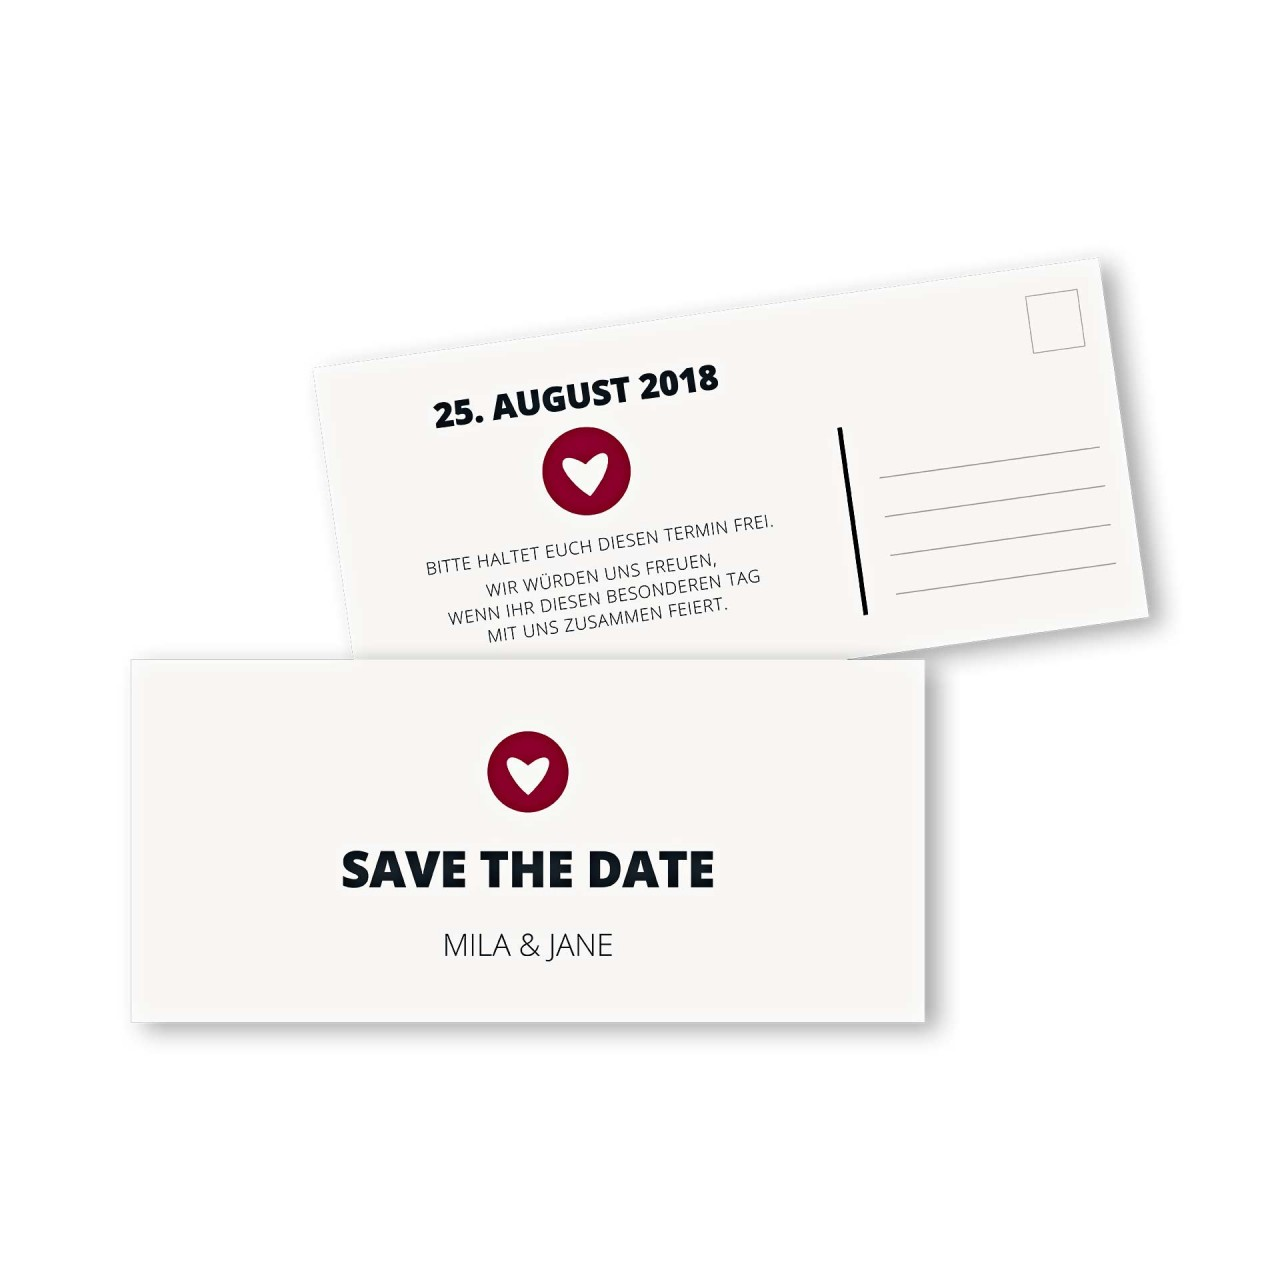 Save the Date Postkarte DIN lang im Design moderne Hochzeitskarte